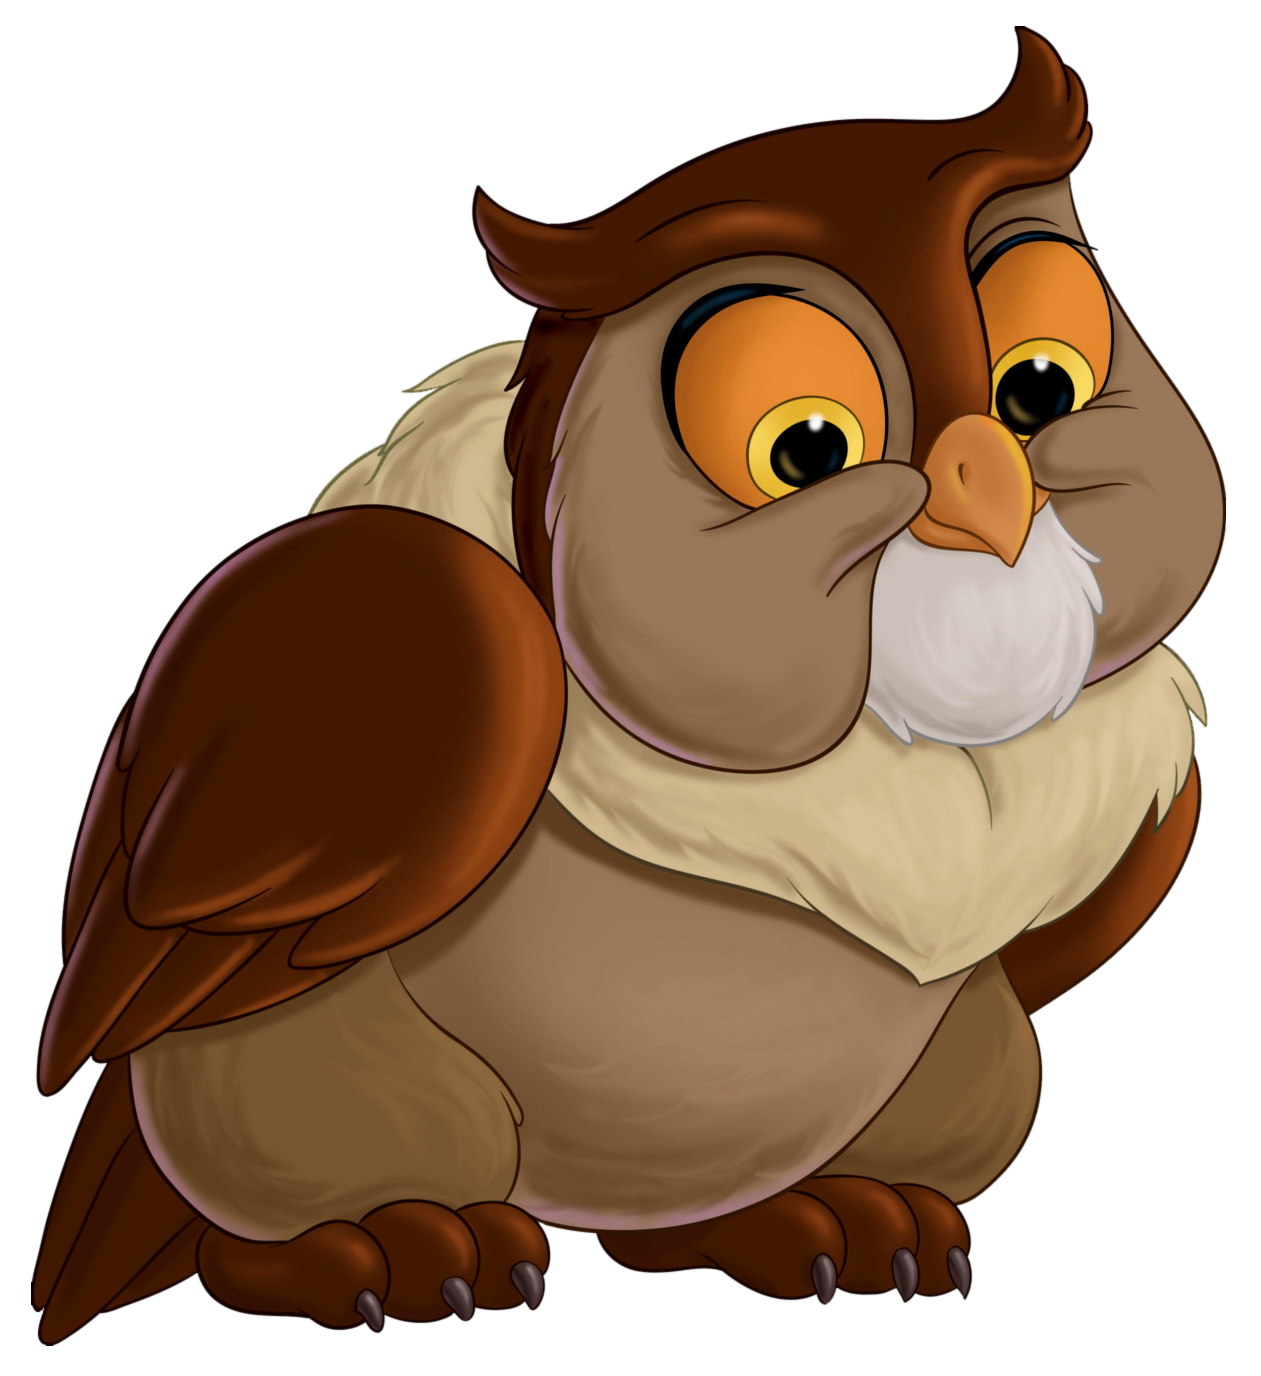 Bambi Friend Owl Transparent PNG Clip Art Image.